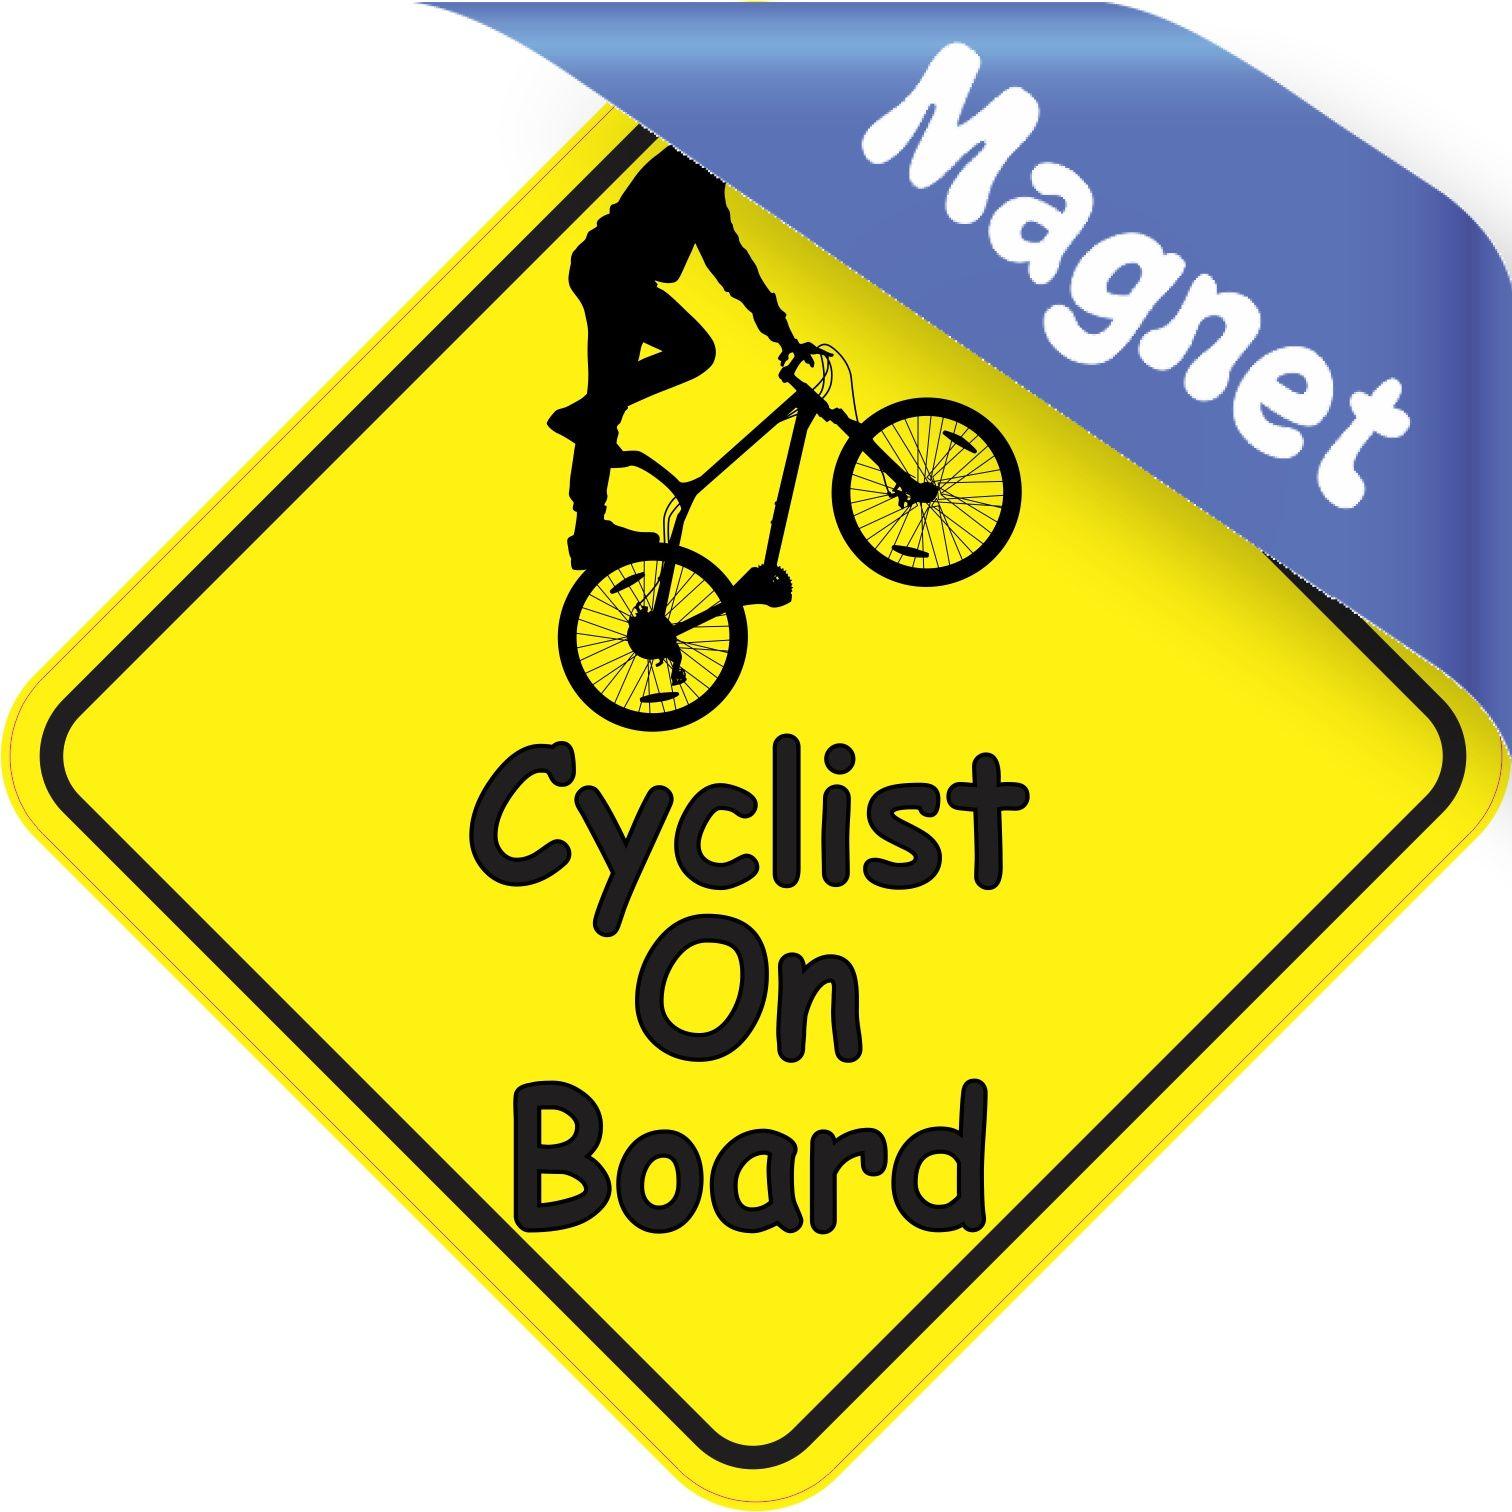 5in X 5in Male Cyclist On Board Magnet Vinyl Window Decals Bumper Stickers Bumper Magnets [ 1512 x 1512 Pixel ]